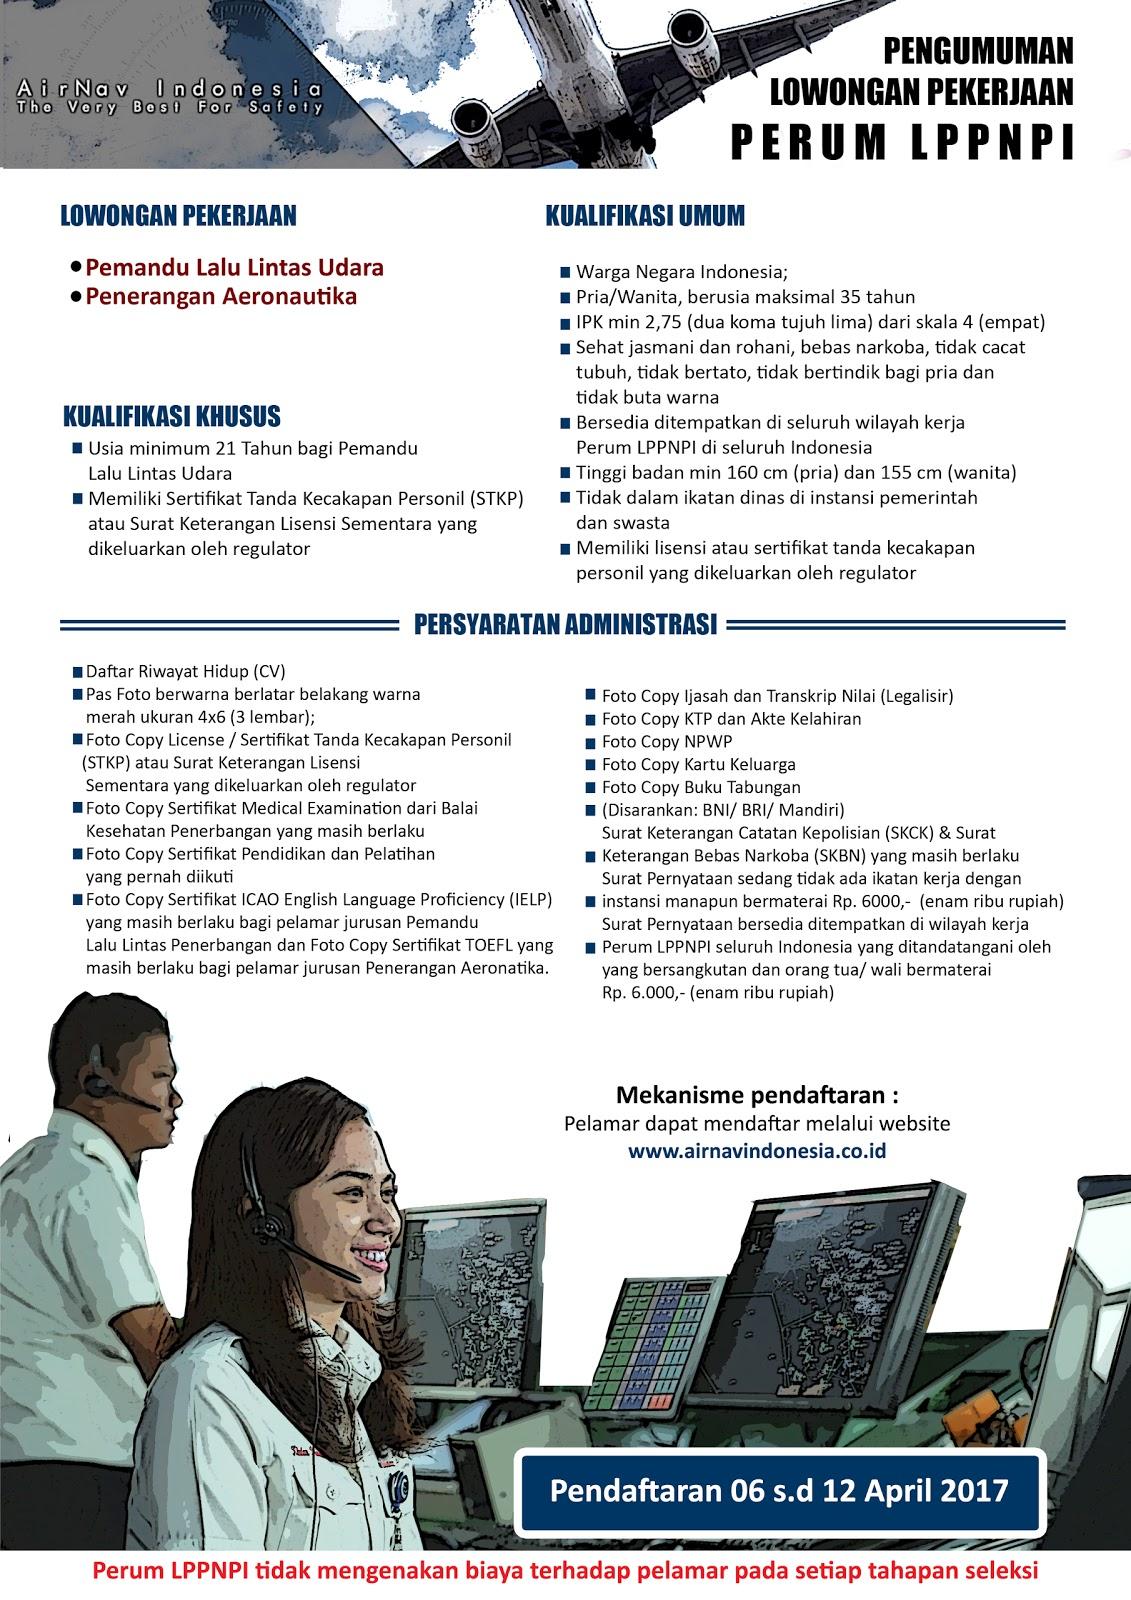 Rekrutmen Perum LPPNPI Tahun 2017 IPK Minimal 2.75